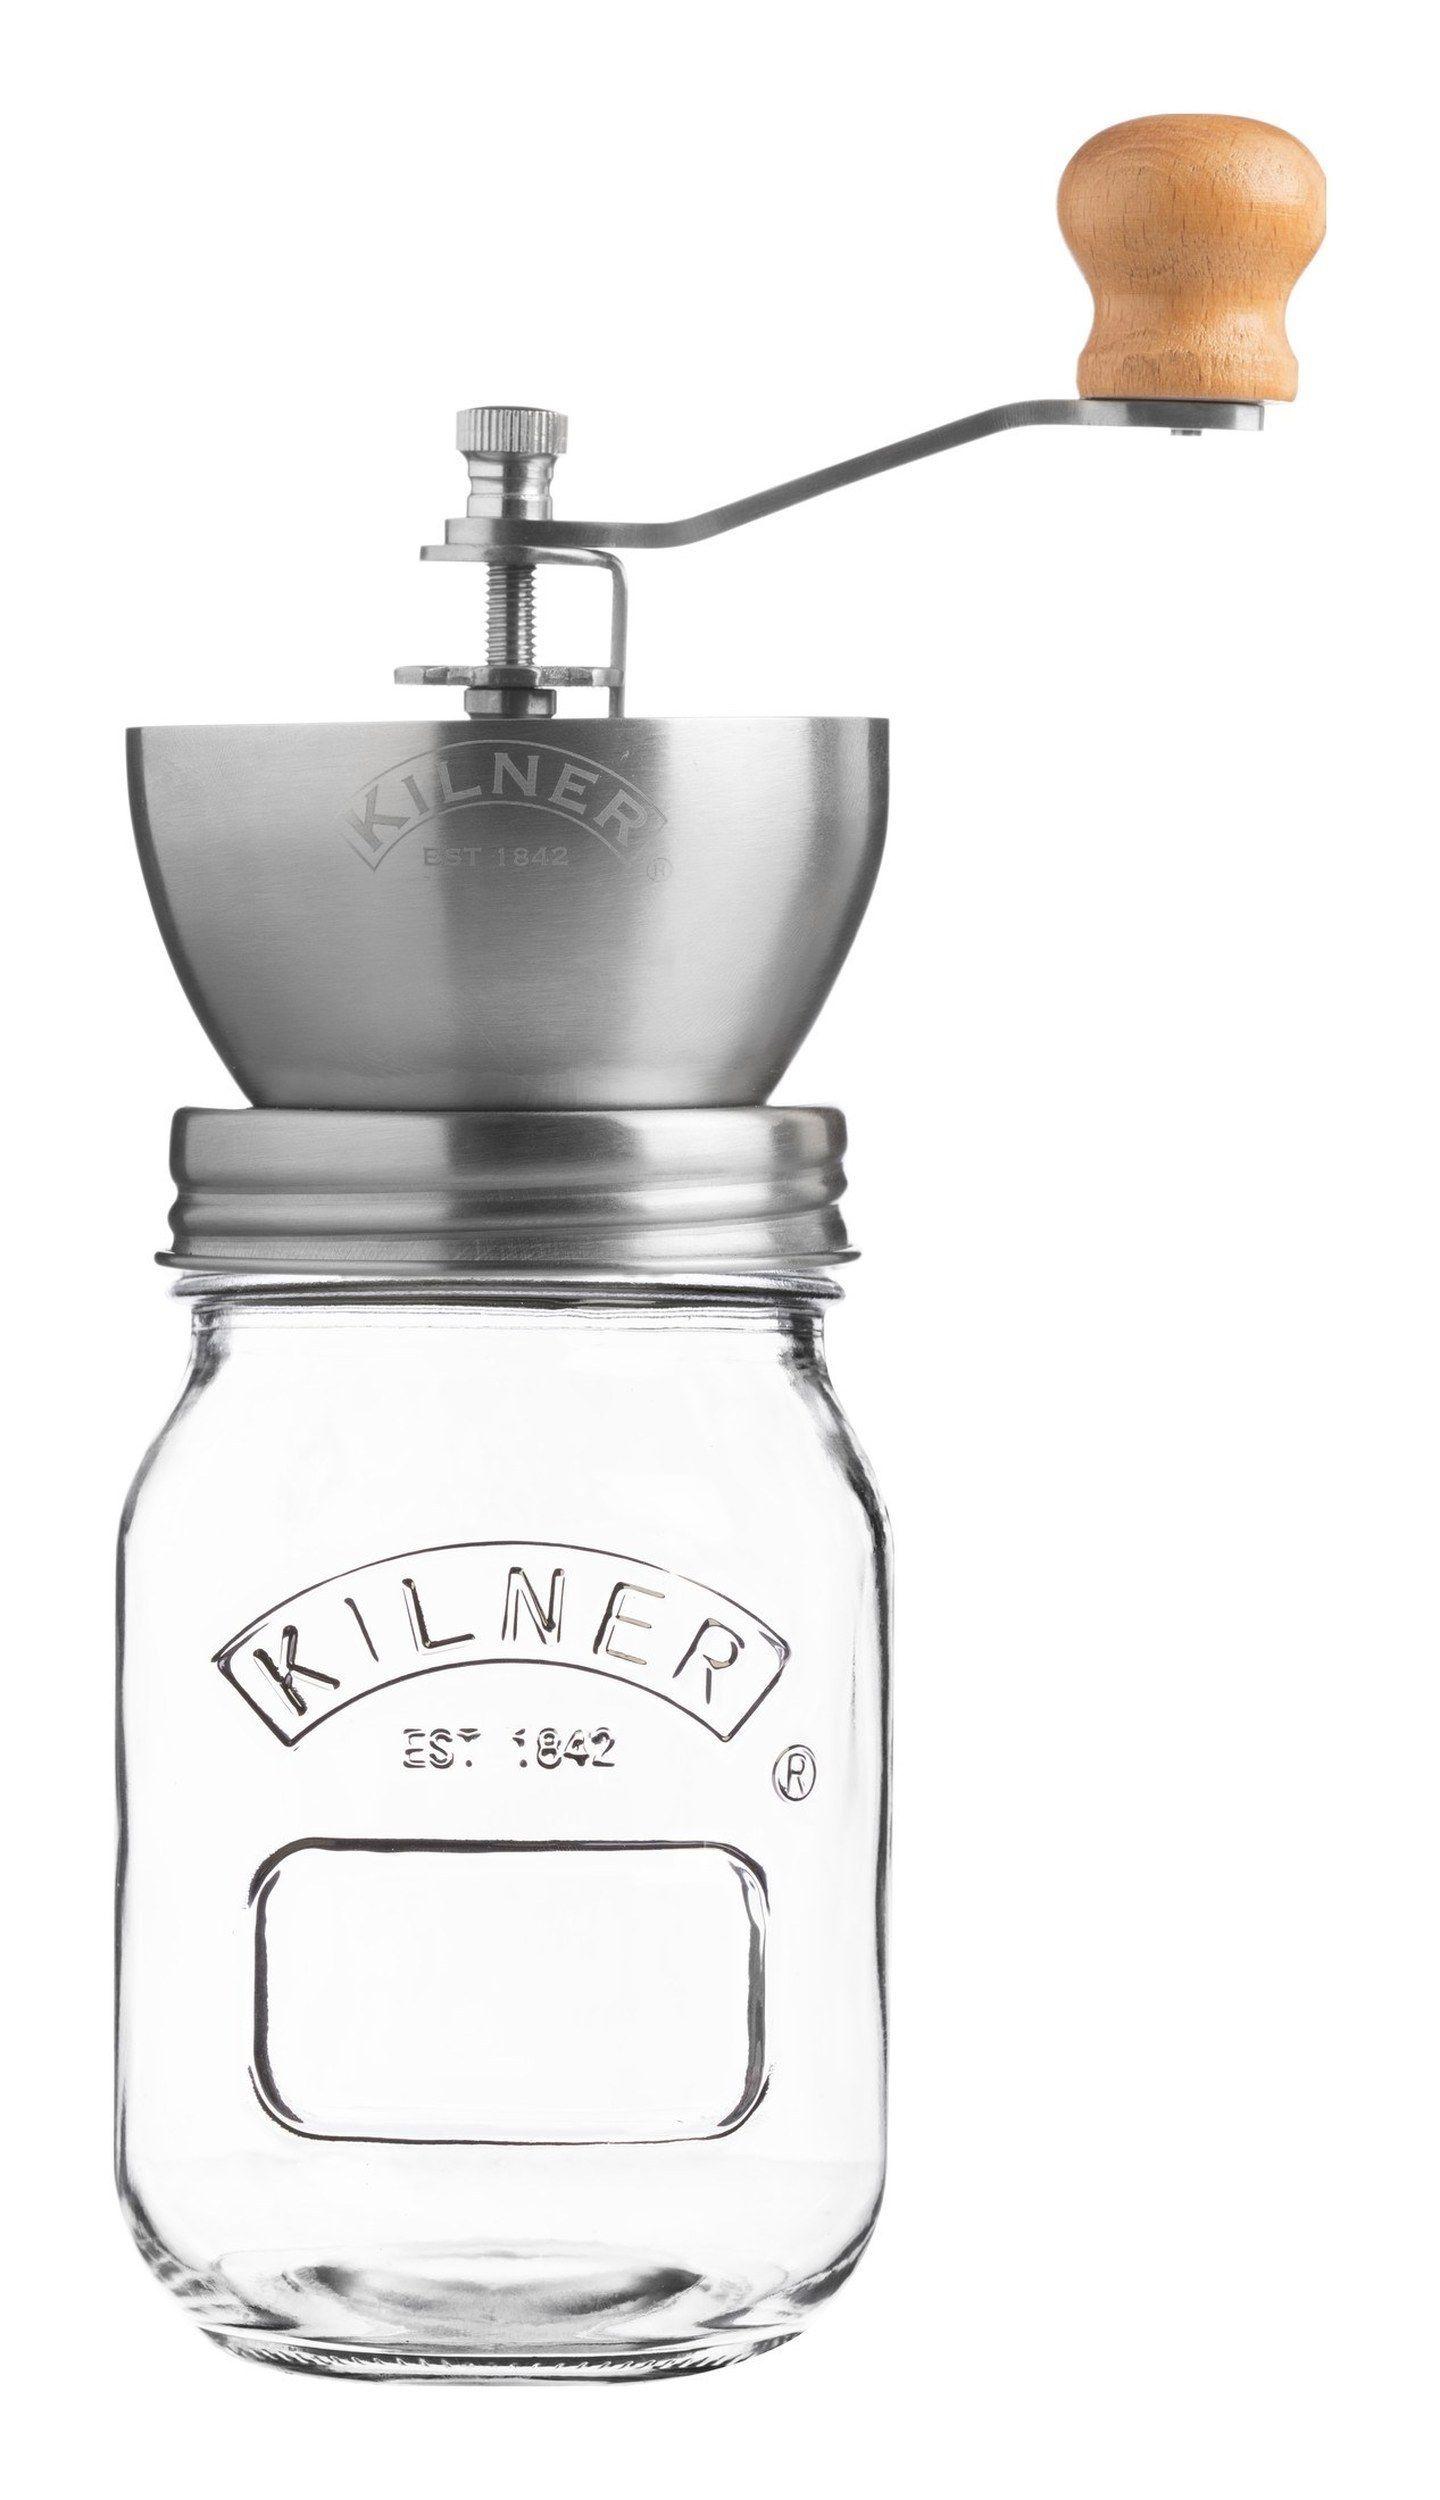 Kilner Coffee grinder Kilner in 2020 Manual coffee